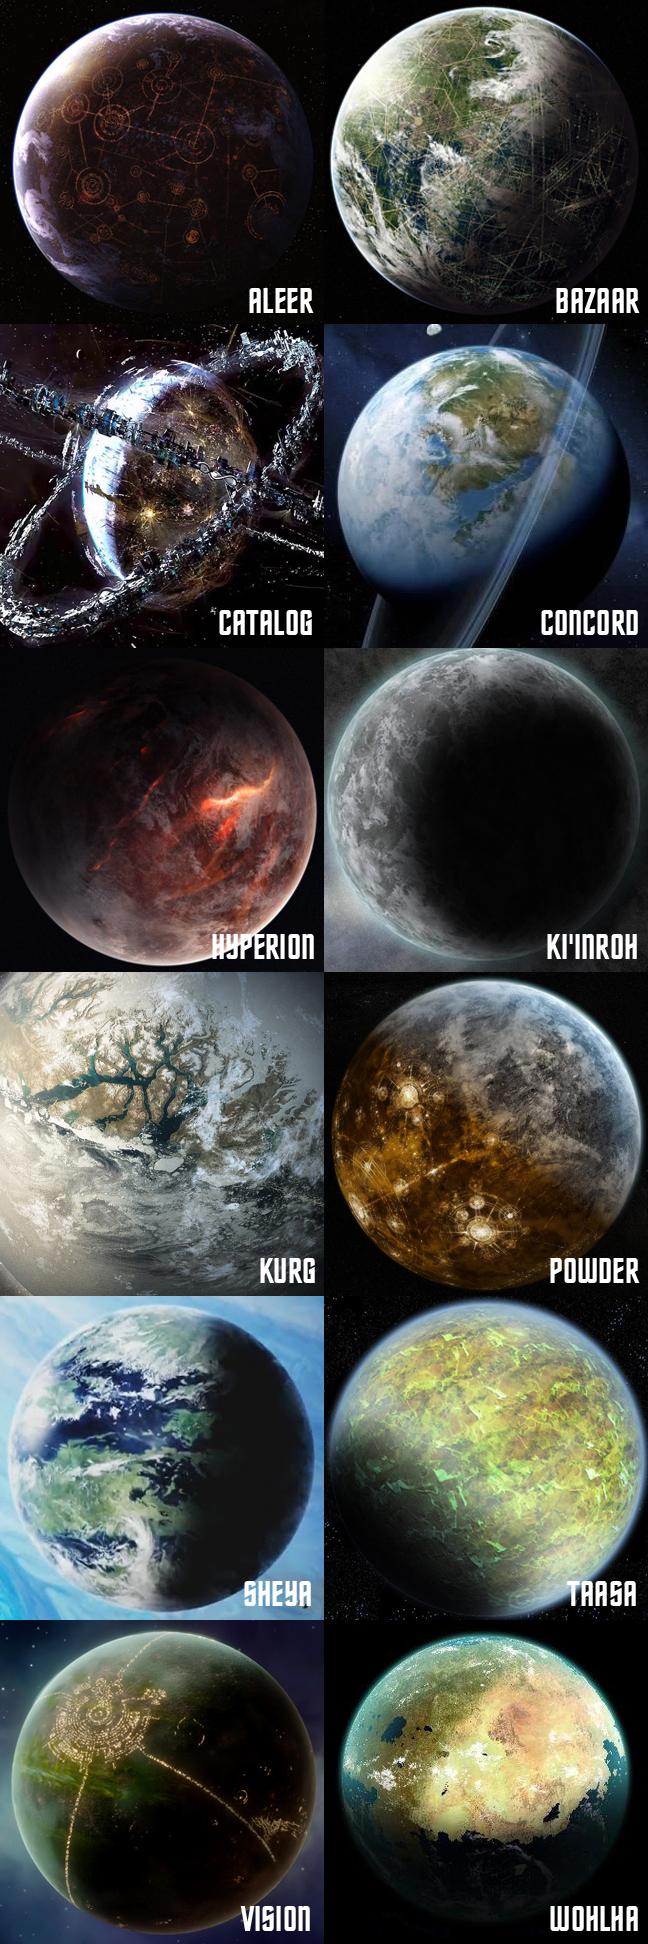 sidebar_planets.jpg